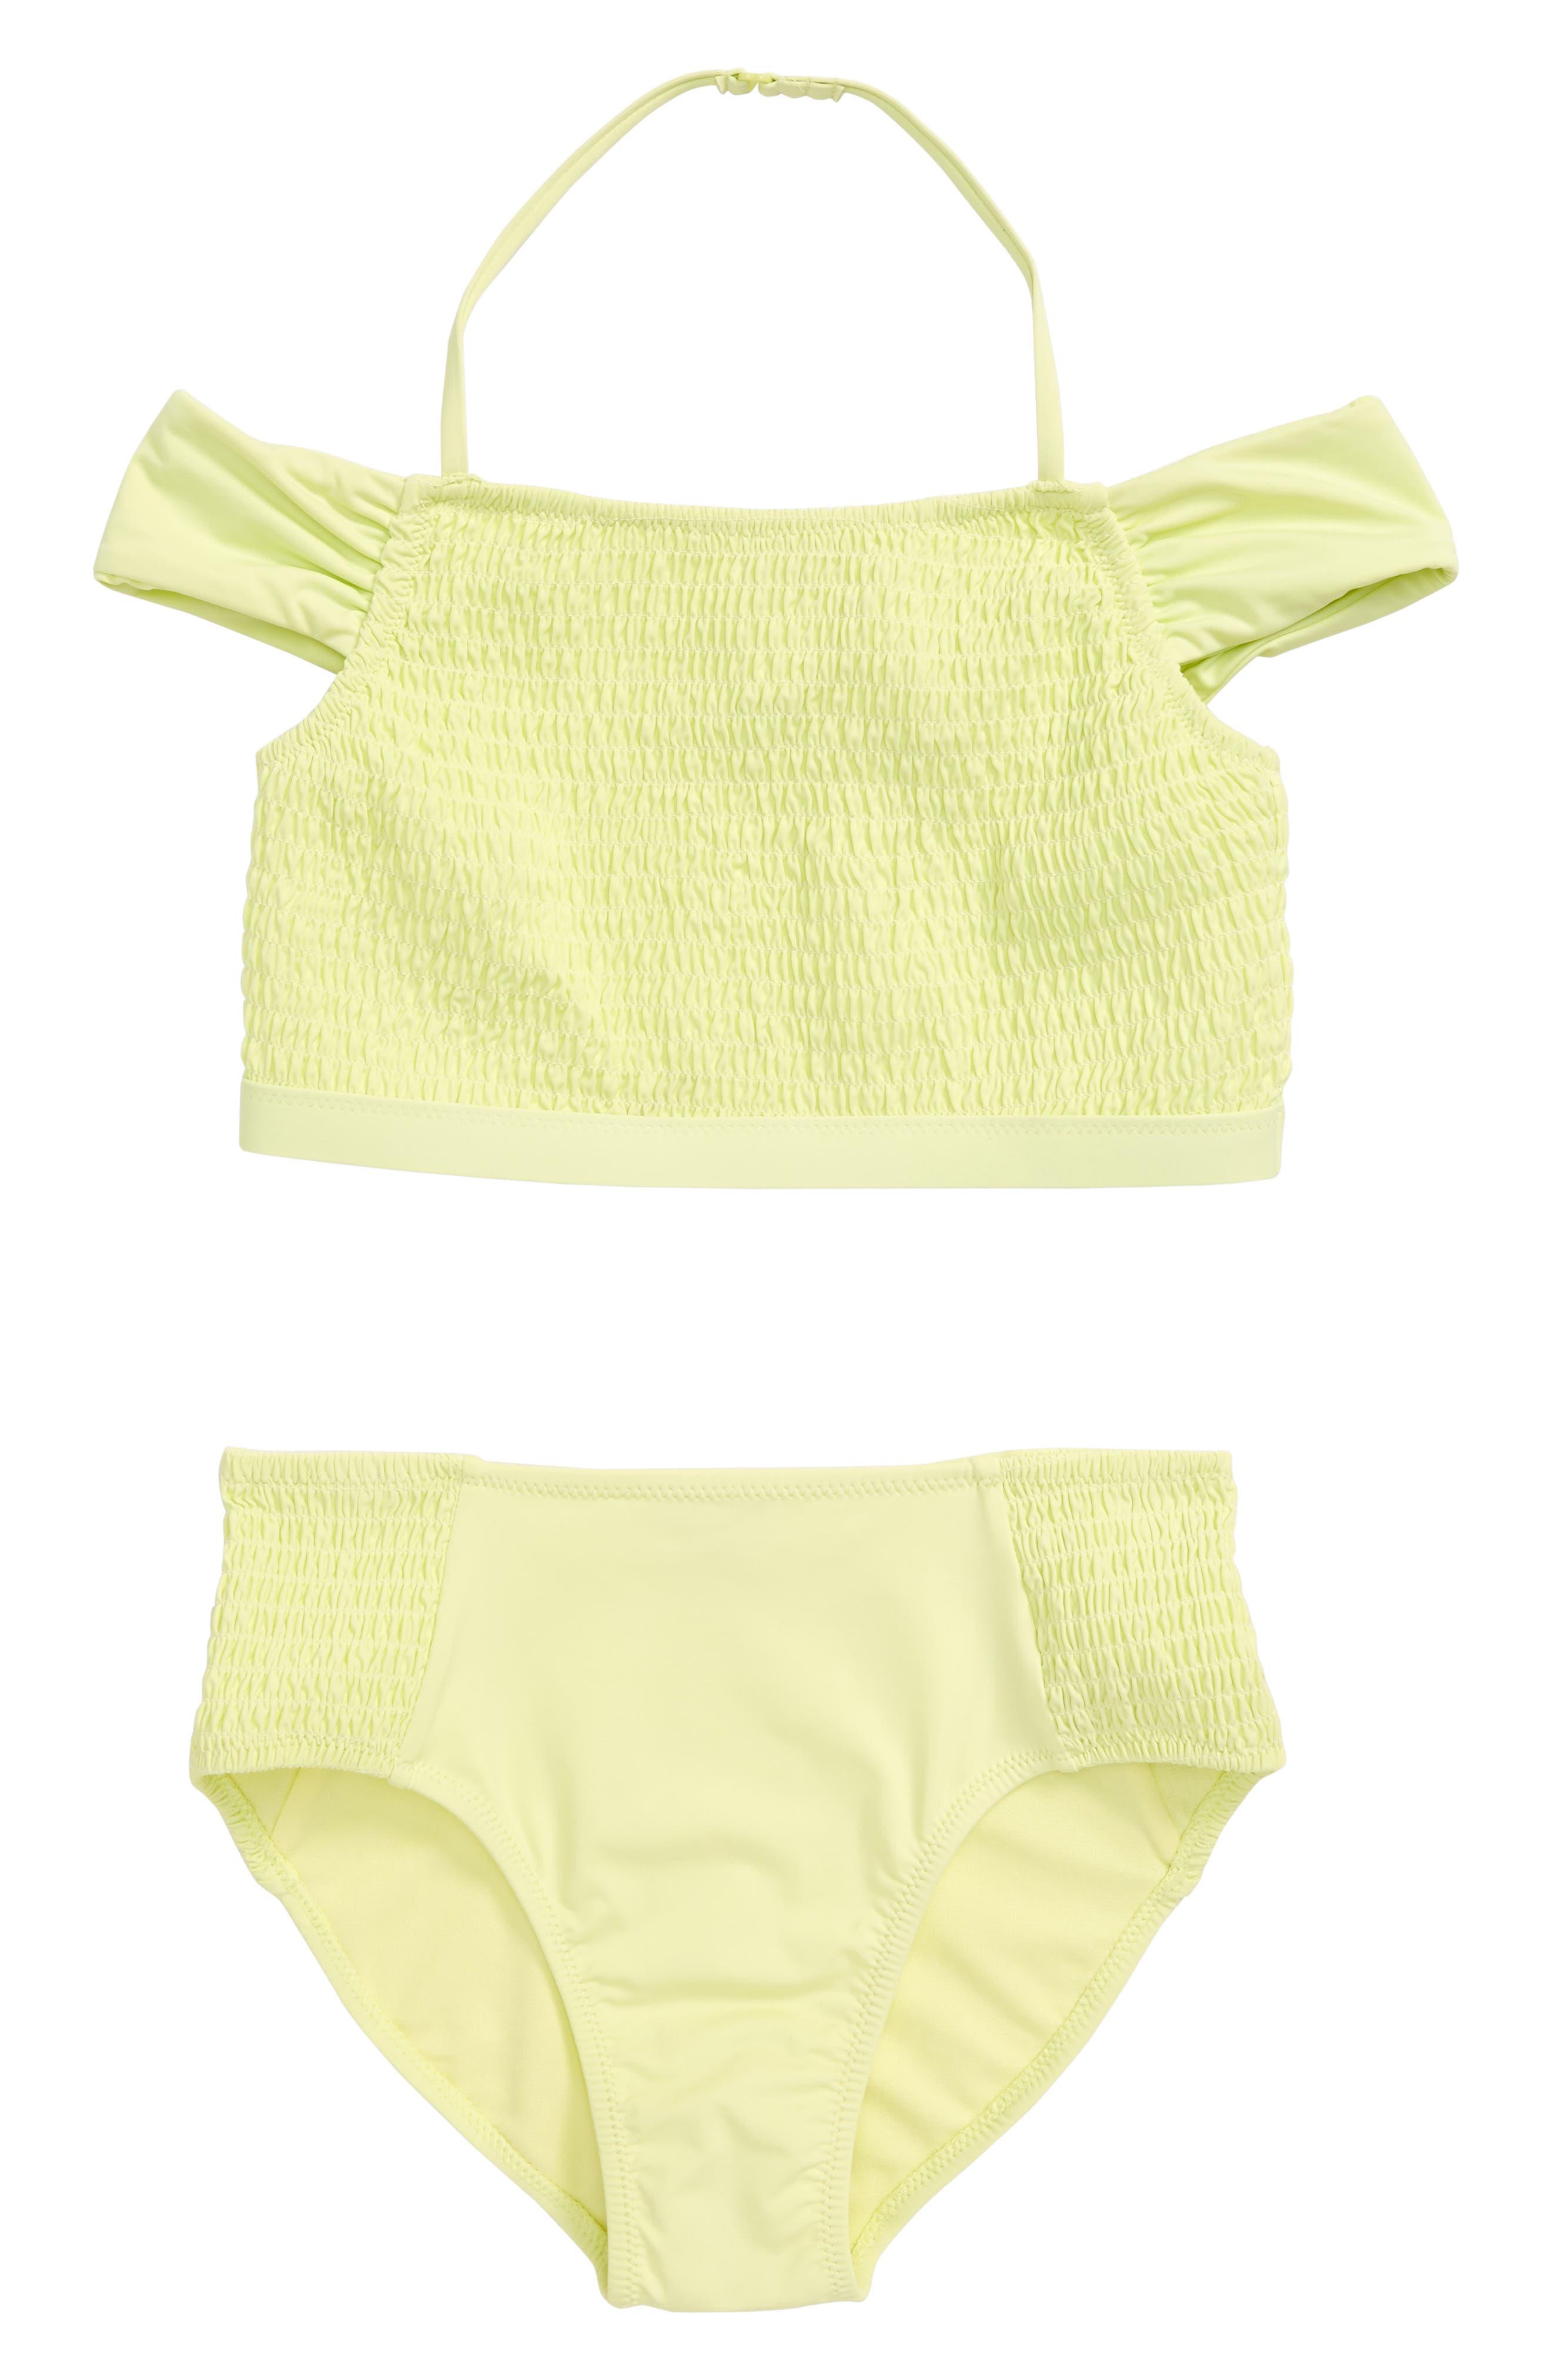 Image of Habitual Kids Smocked Tankini 2-Piece Swimsuit Set